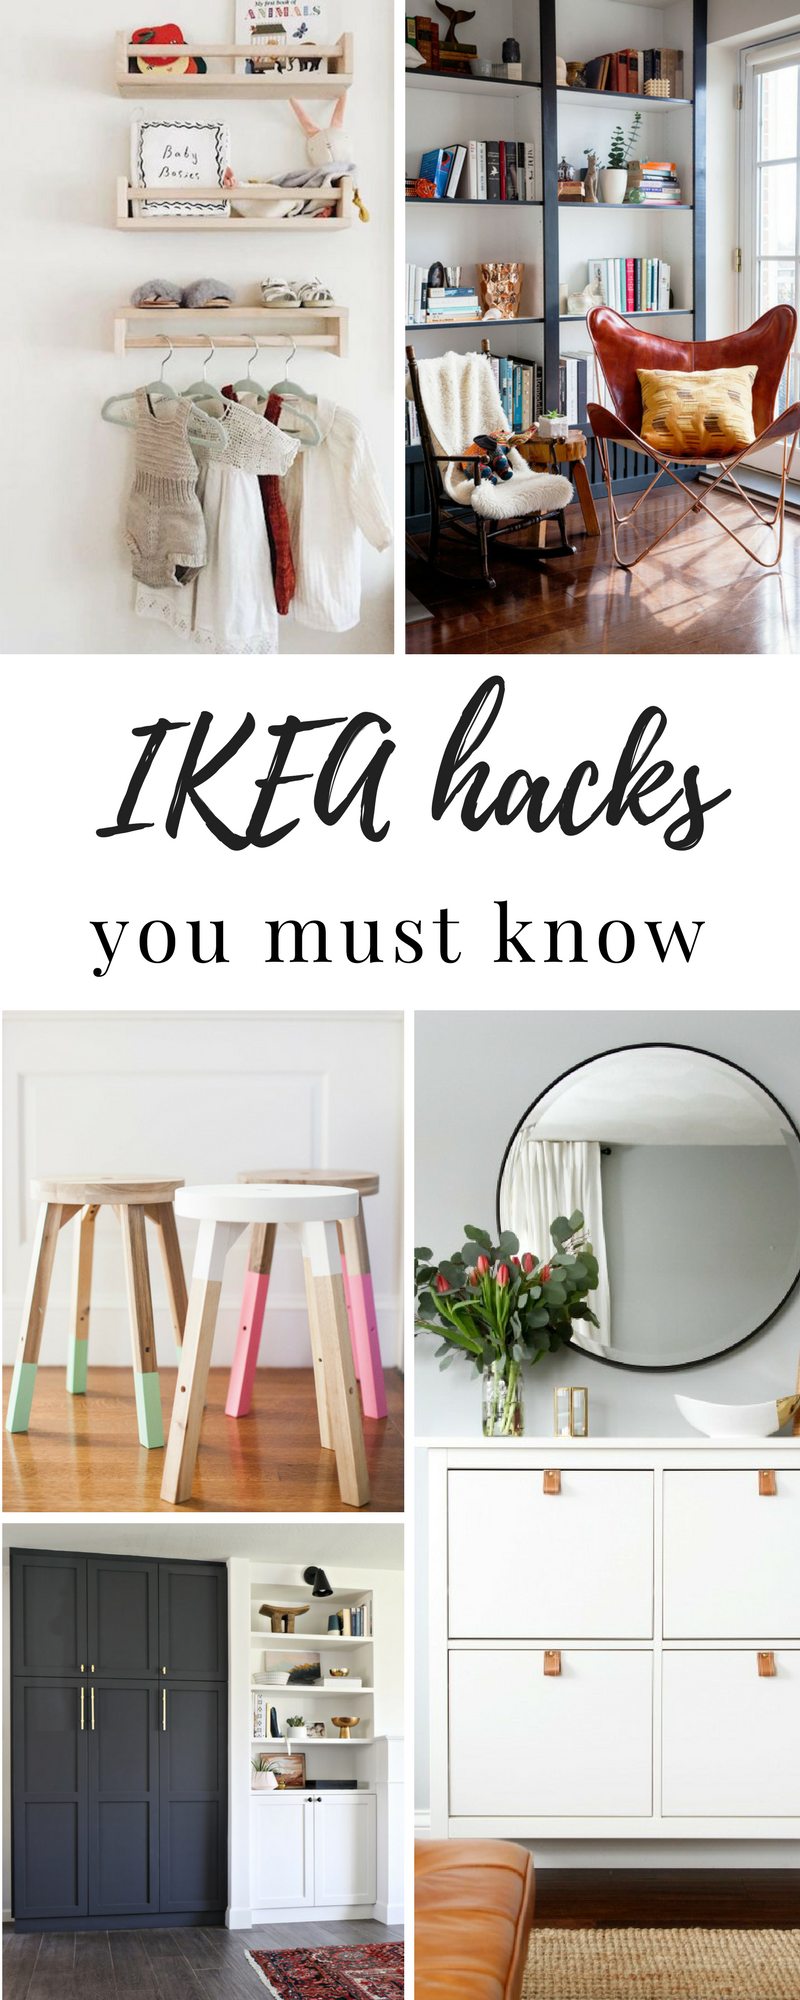 7 Amazing Ikea Hacks You Must Know Ikea Hack Ikea Furniture Hacks Diy Ikea Hacks